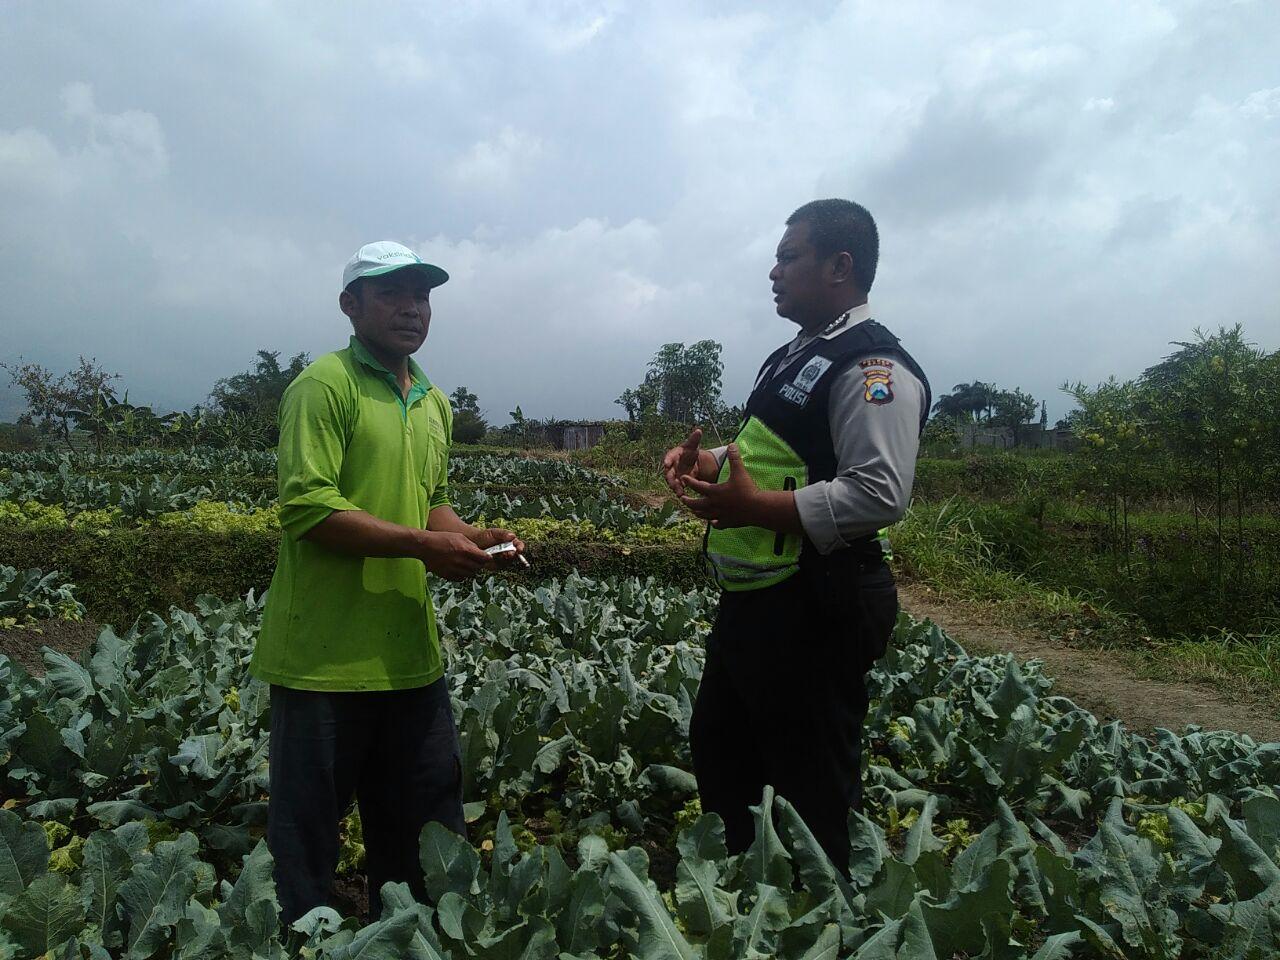 Sambangi Desa Kanit Binmas Polsek Batu Kota Polres Batu Kepada Petani Sayur Desa Sumberejo Batu